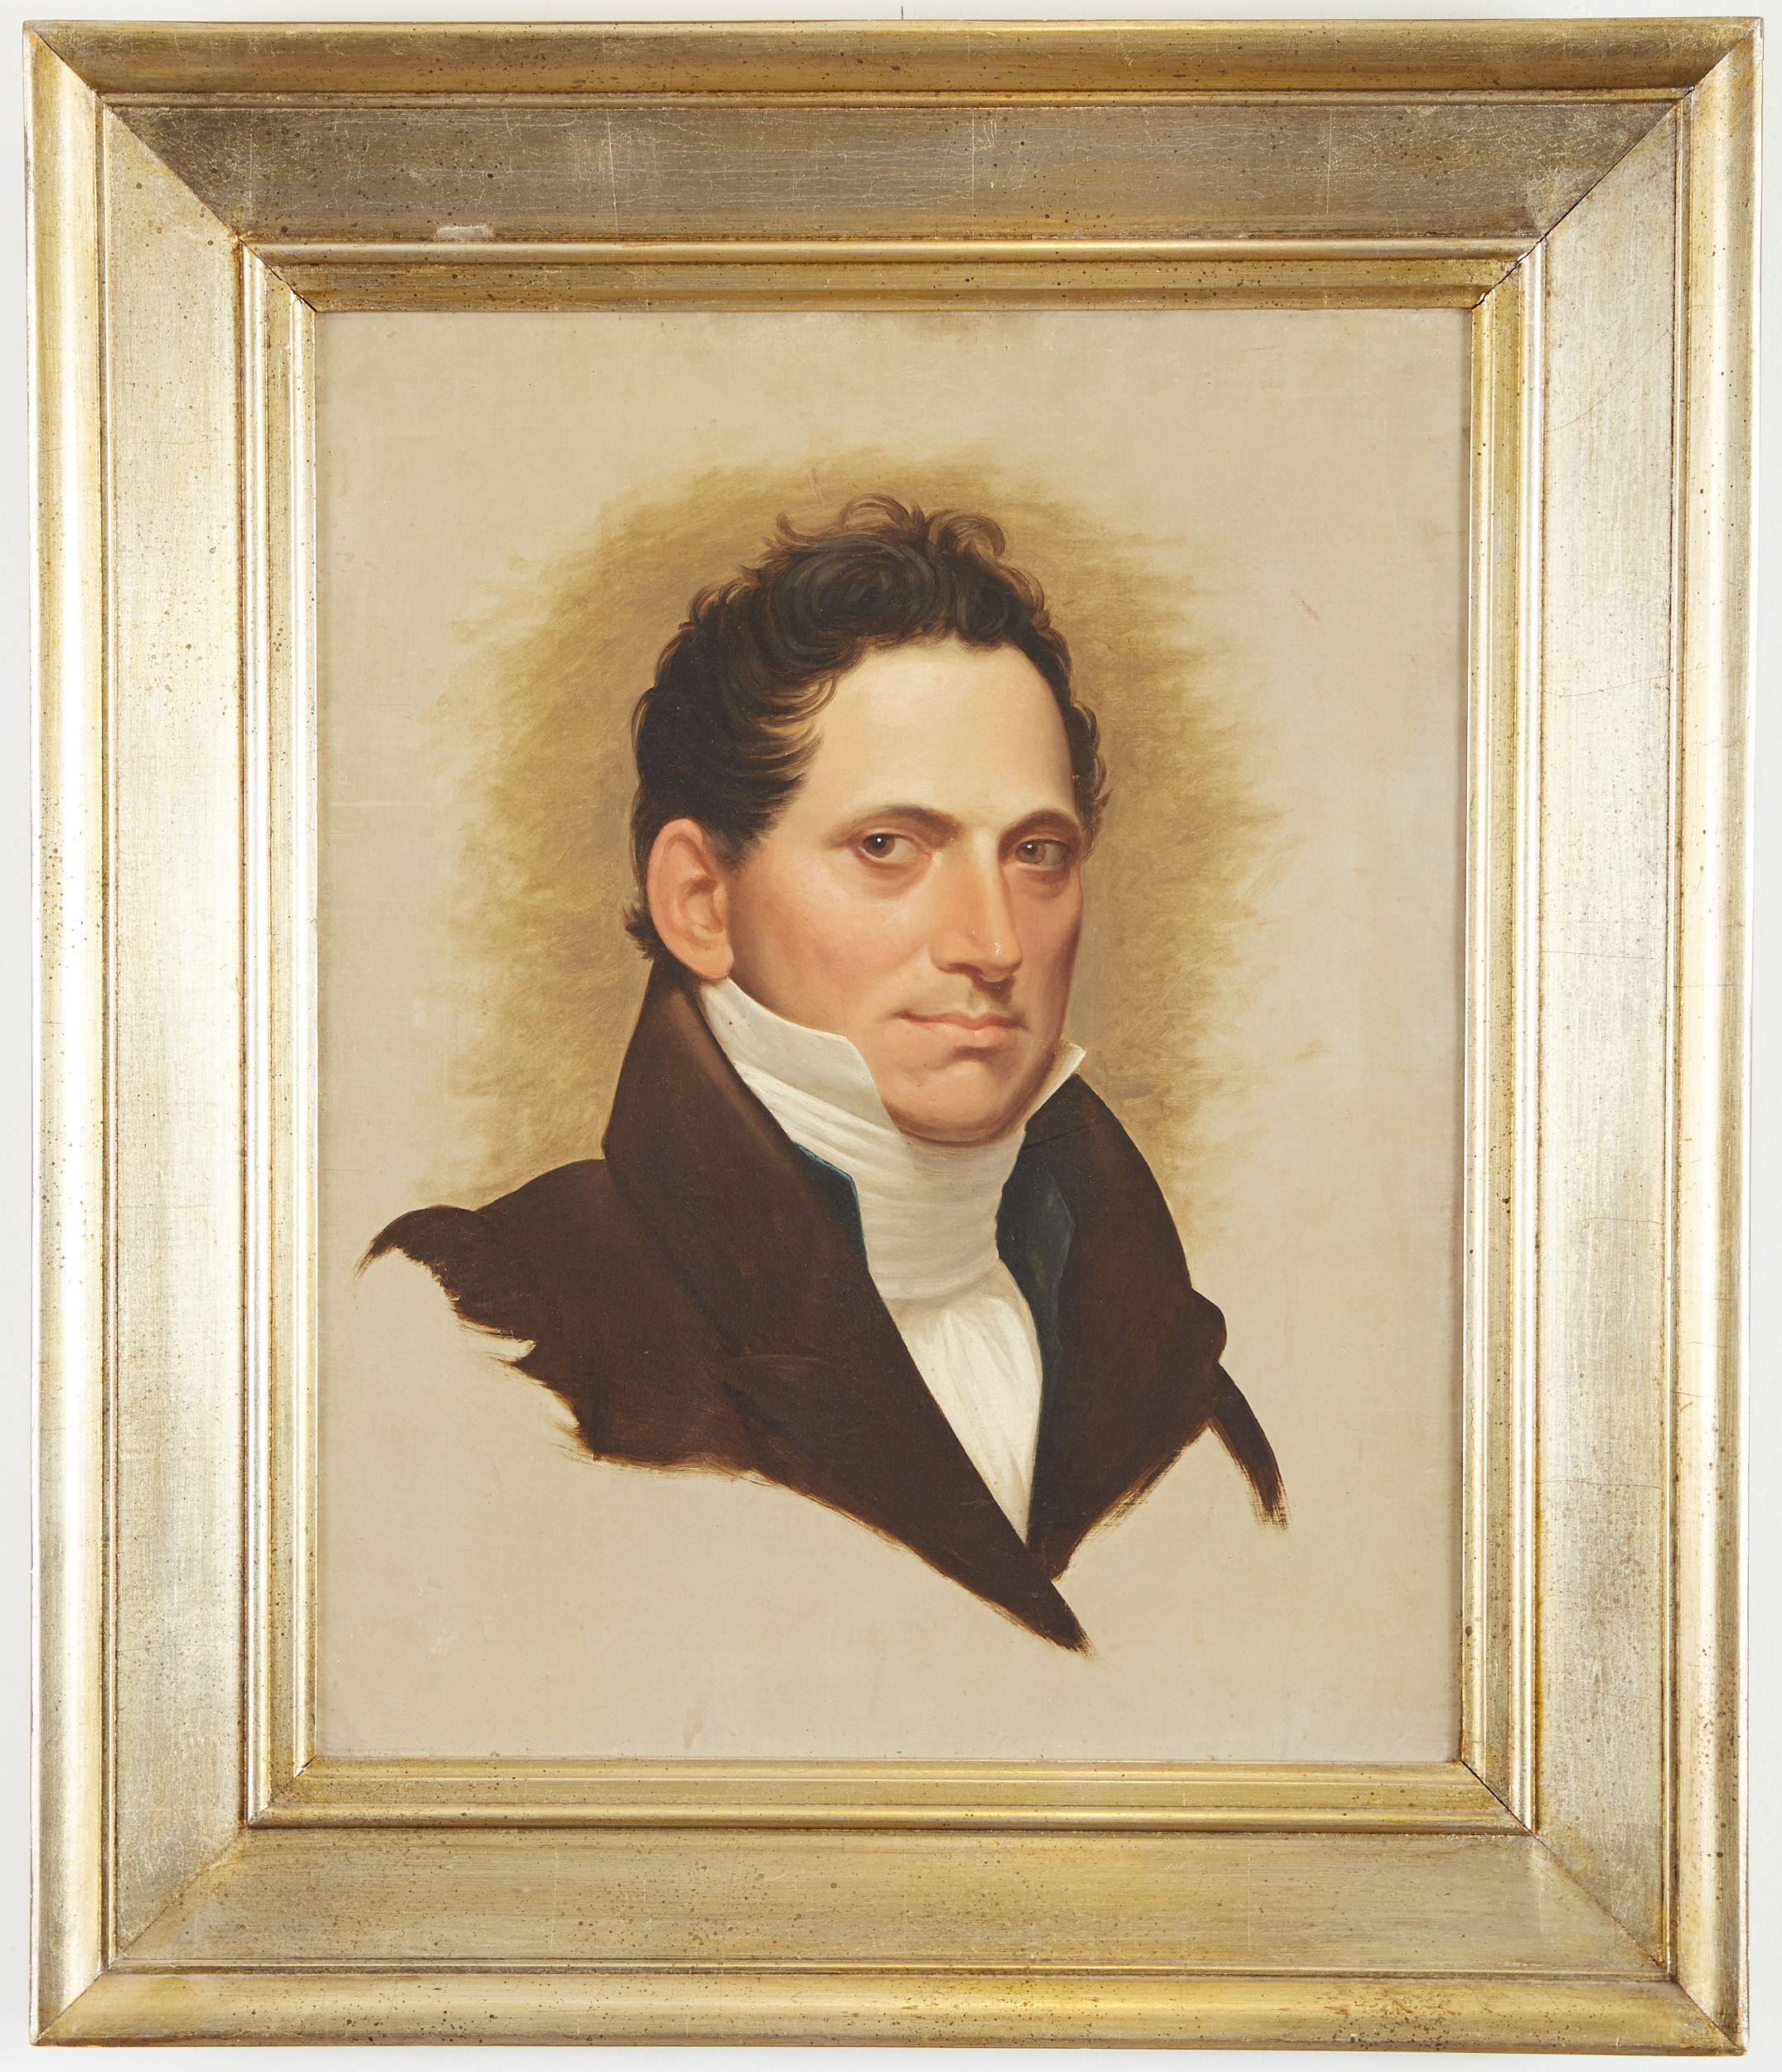 Lot 5 - 19th Century American School Portrait of a Man